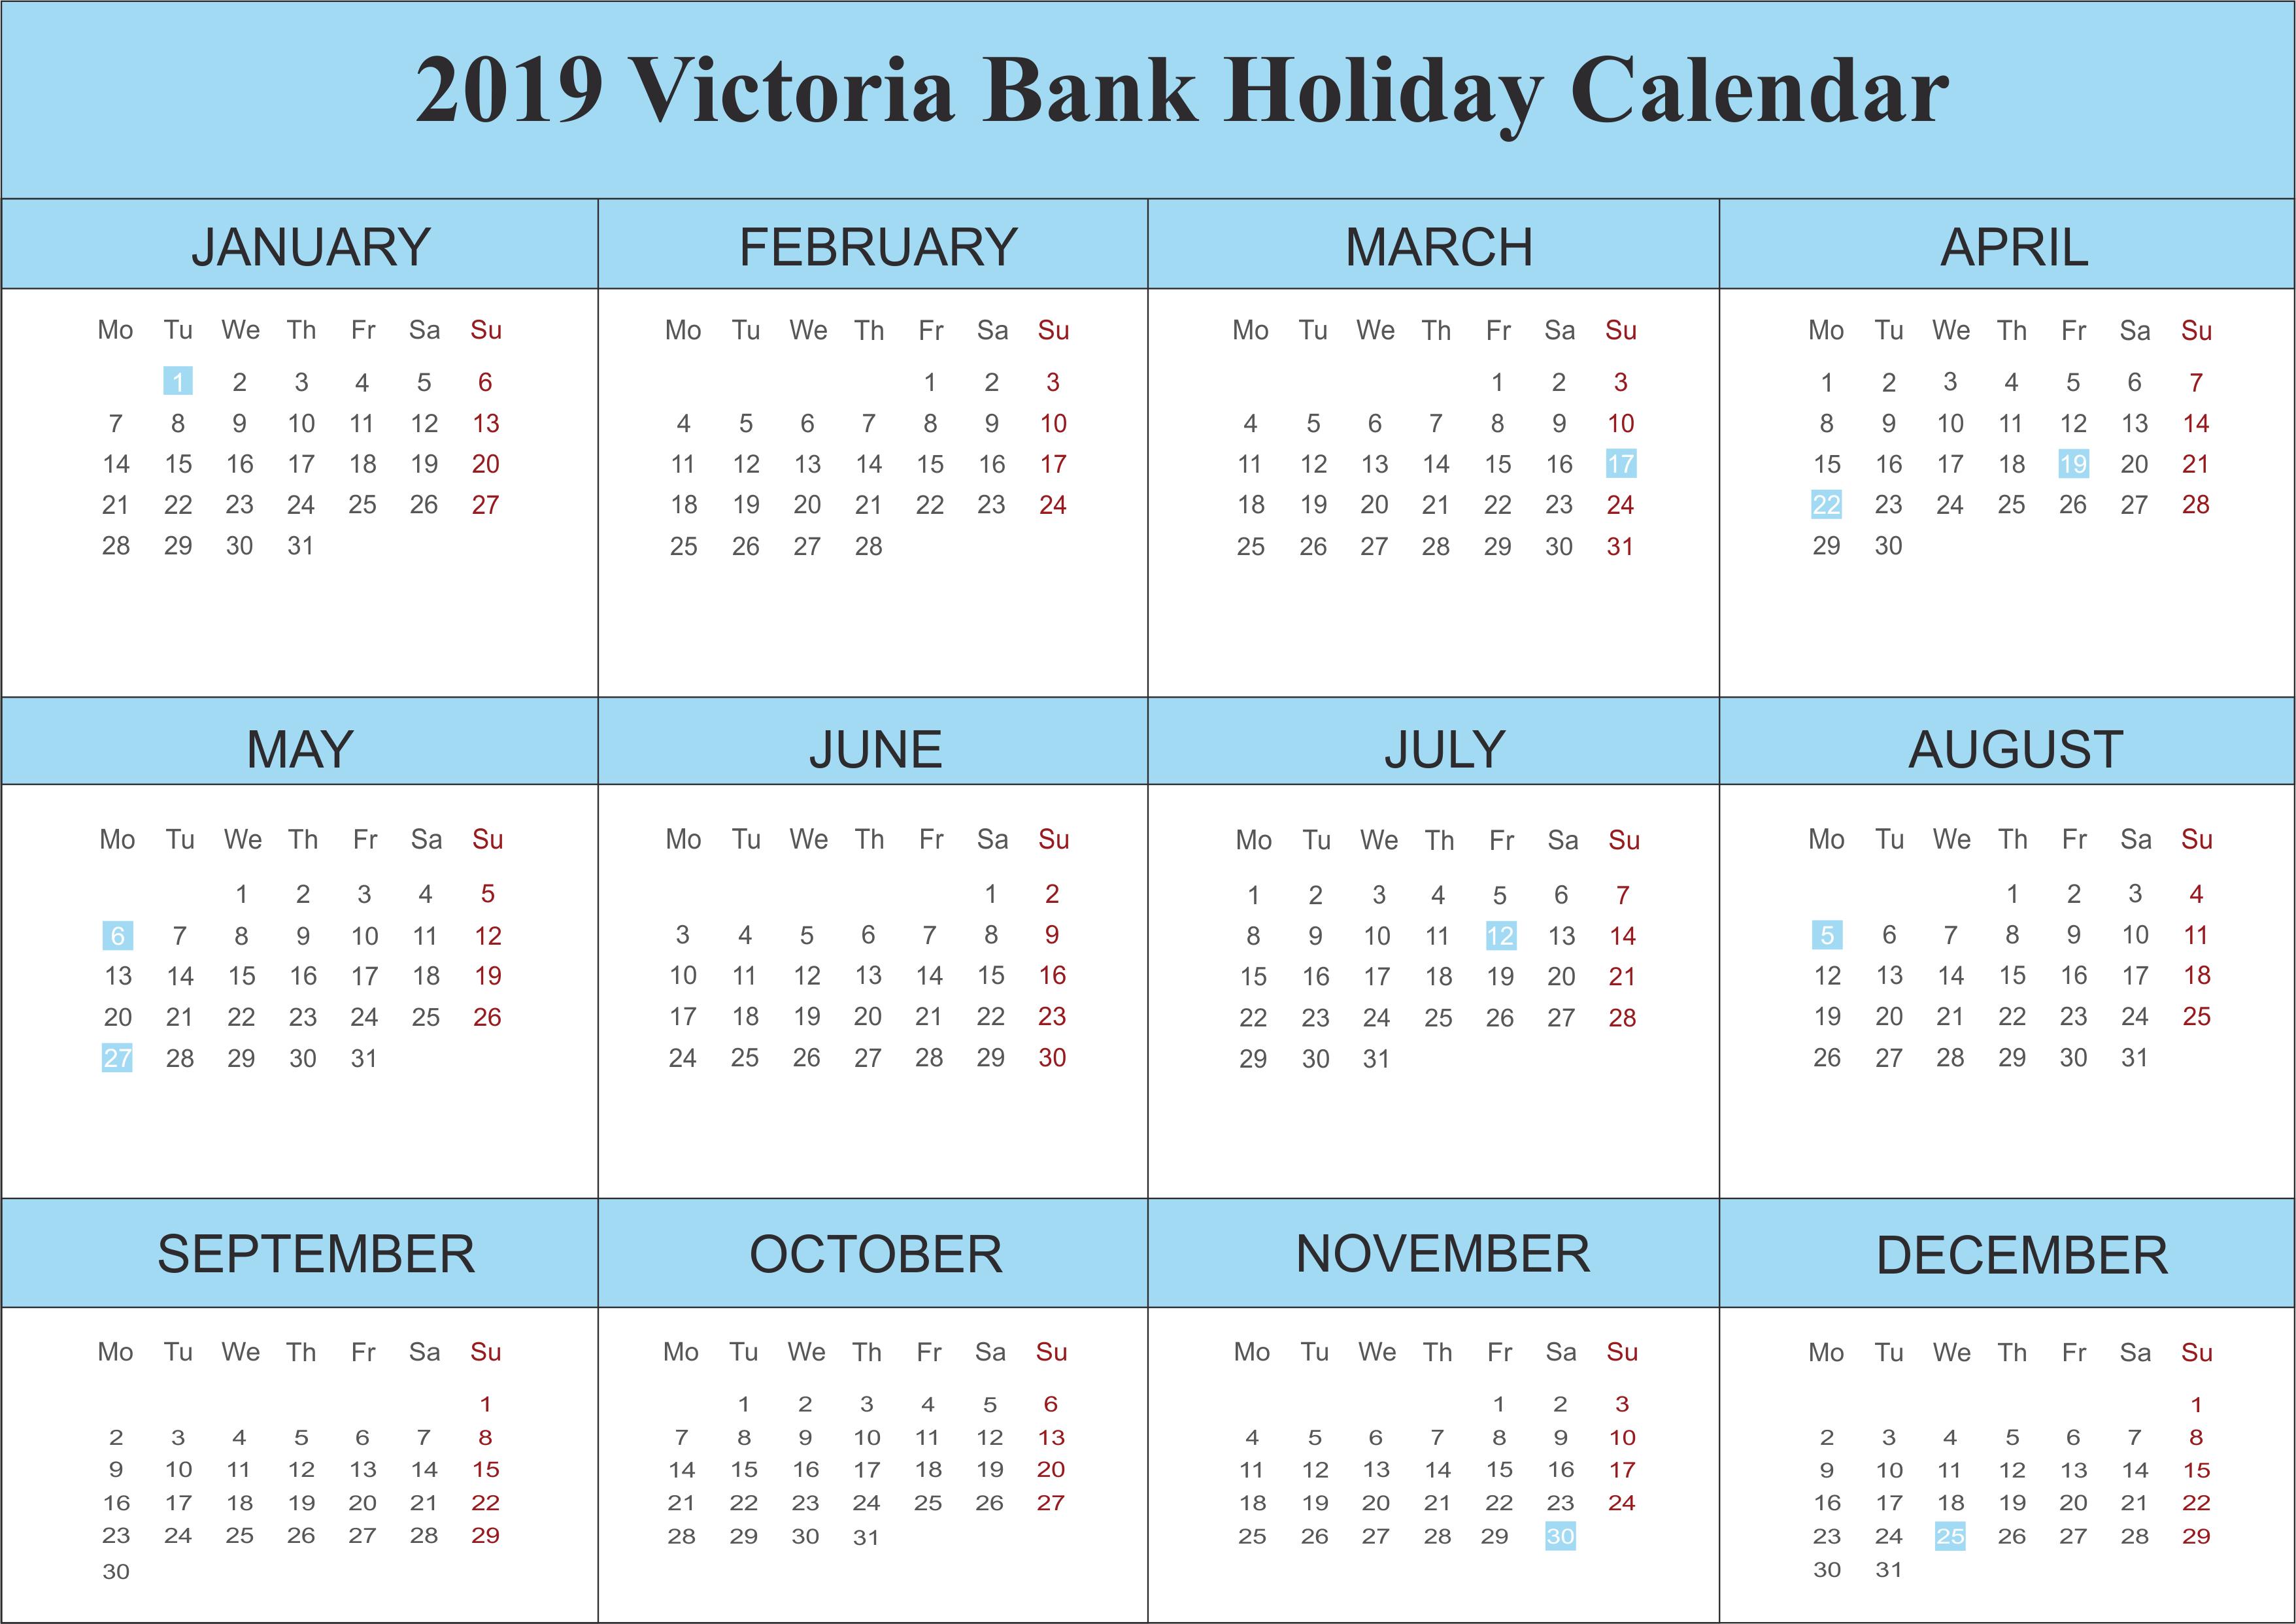 2019 Victoria Blank Holidays Calendar Template 2019calendar 2019printablecalendar 2019calendar Holiday Calendar Holiday Calendar Printable Calendar Template